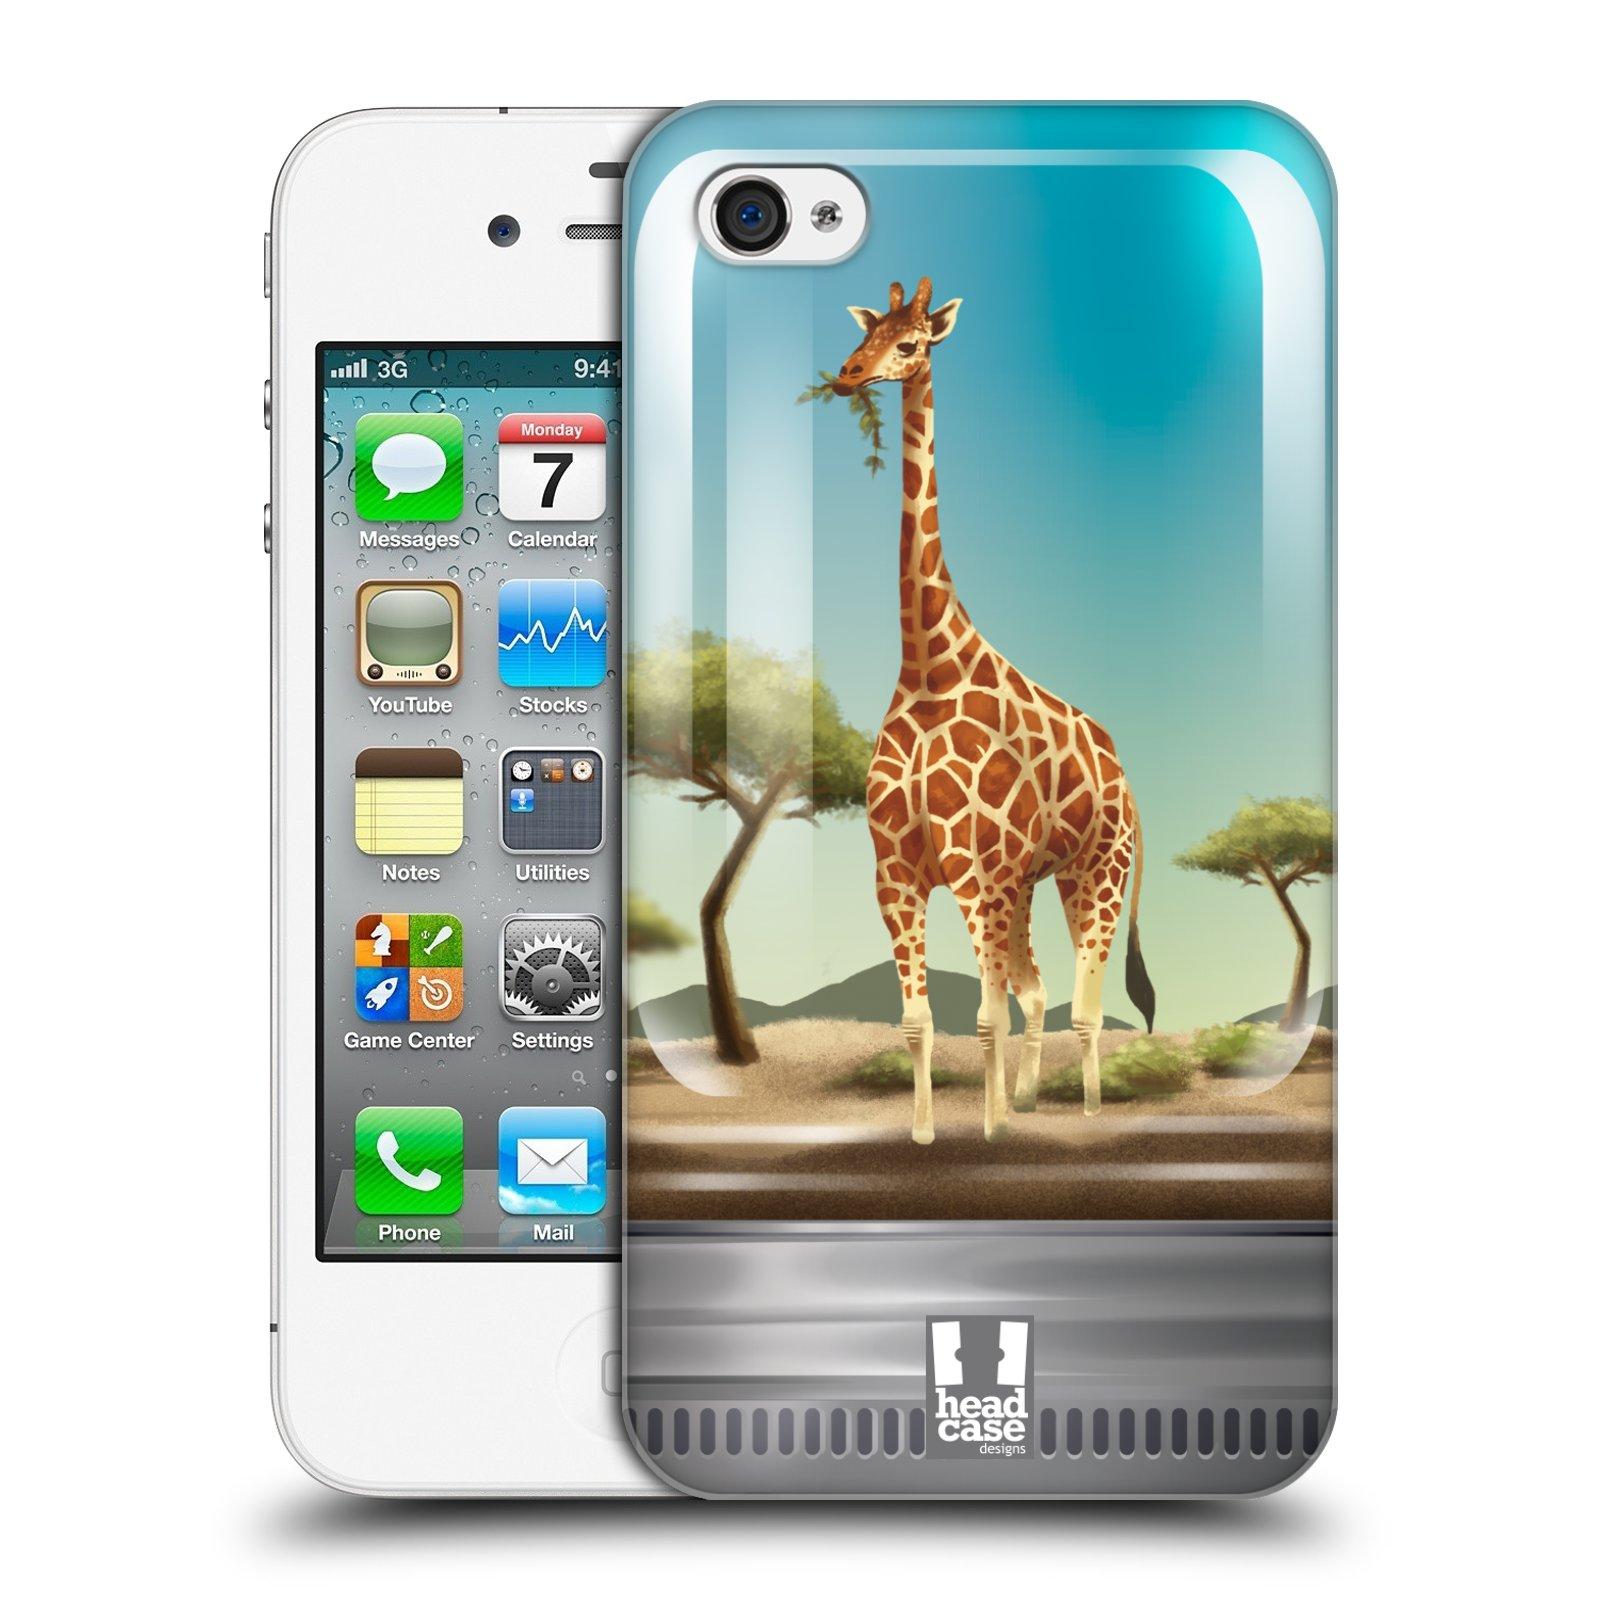 HEAD CASE plastový obal na mobil Apple Iphone 4/4S vzor Zvířátka v těžítku žirafa